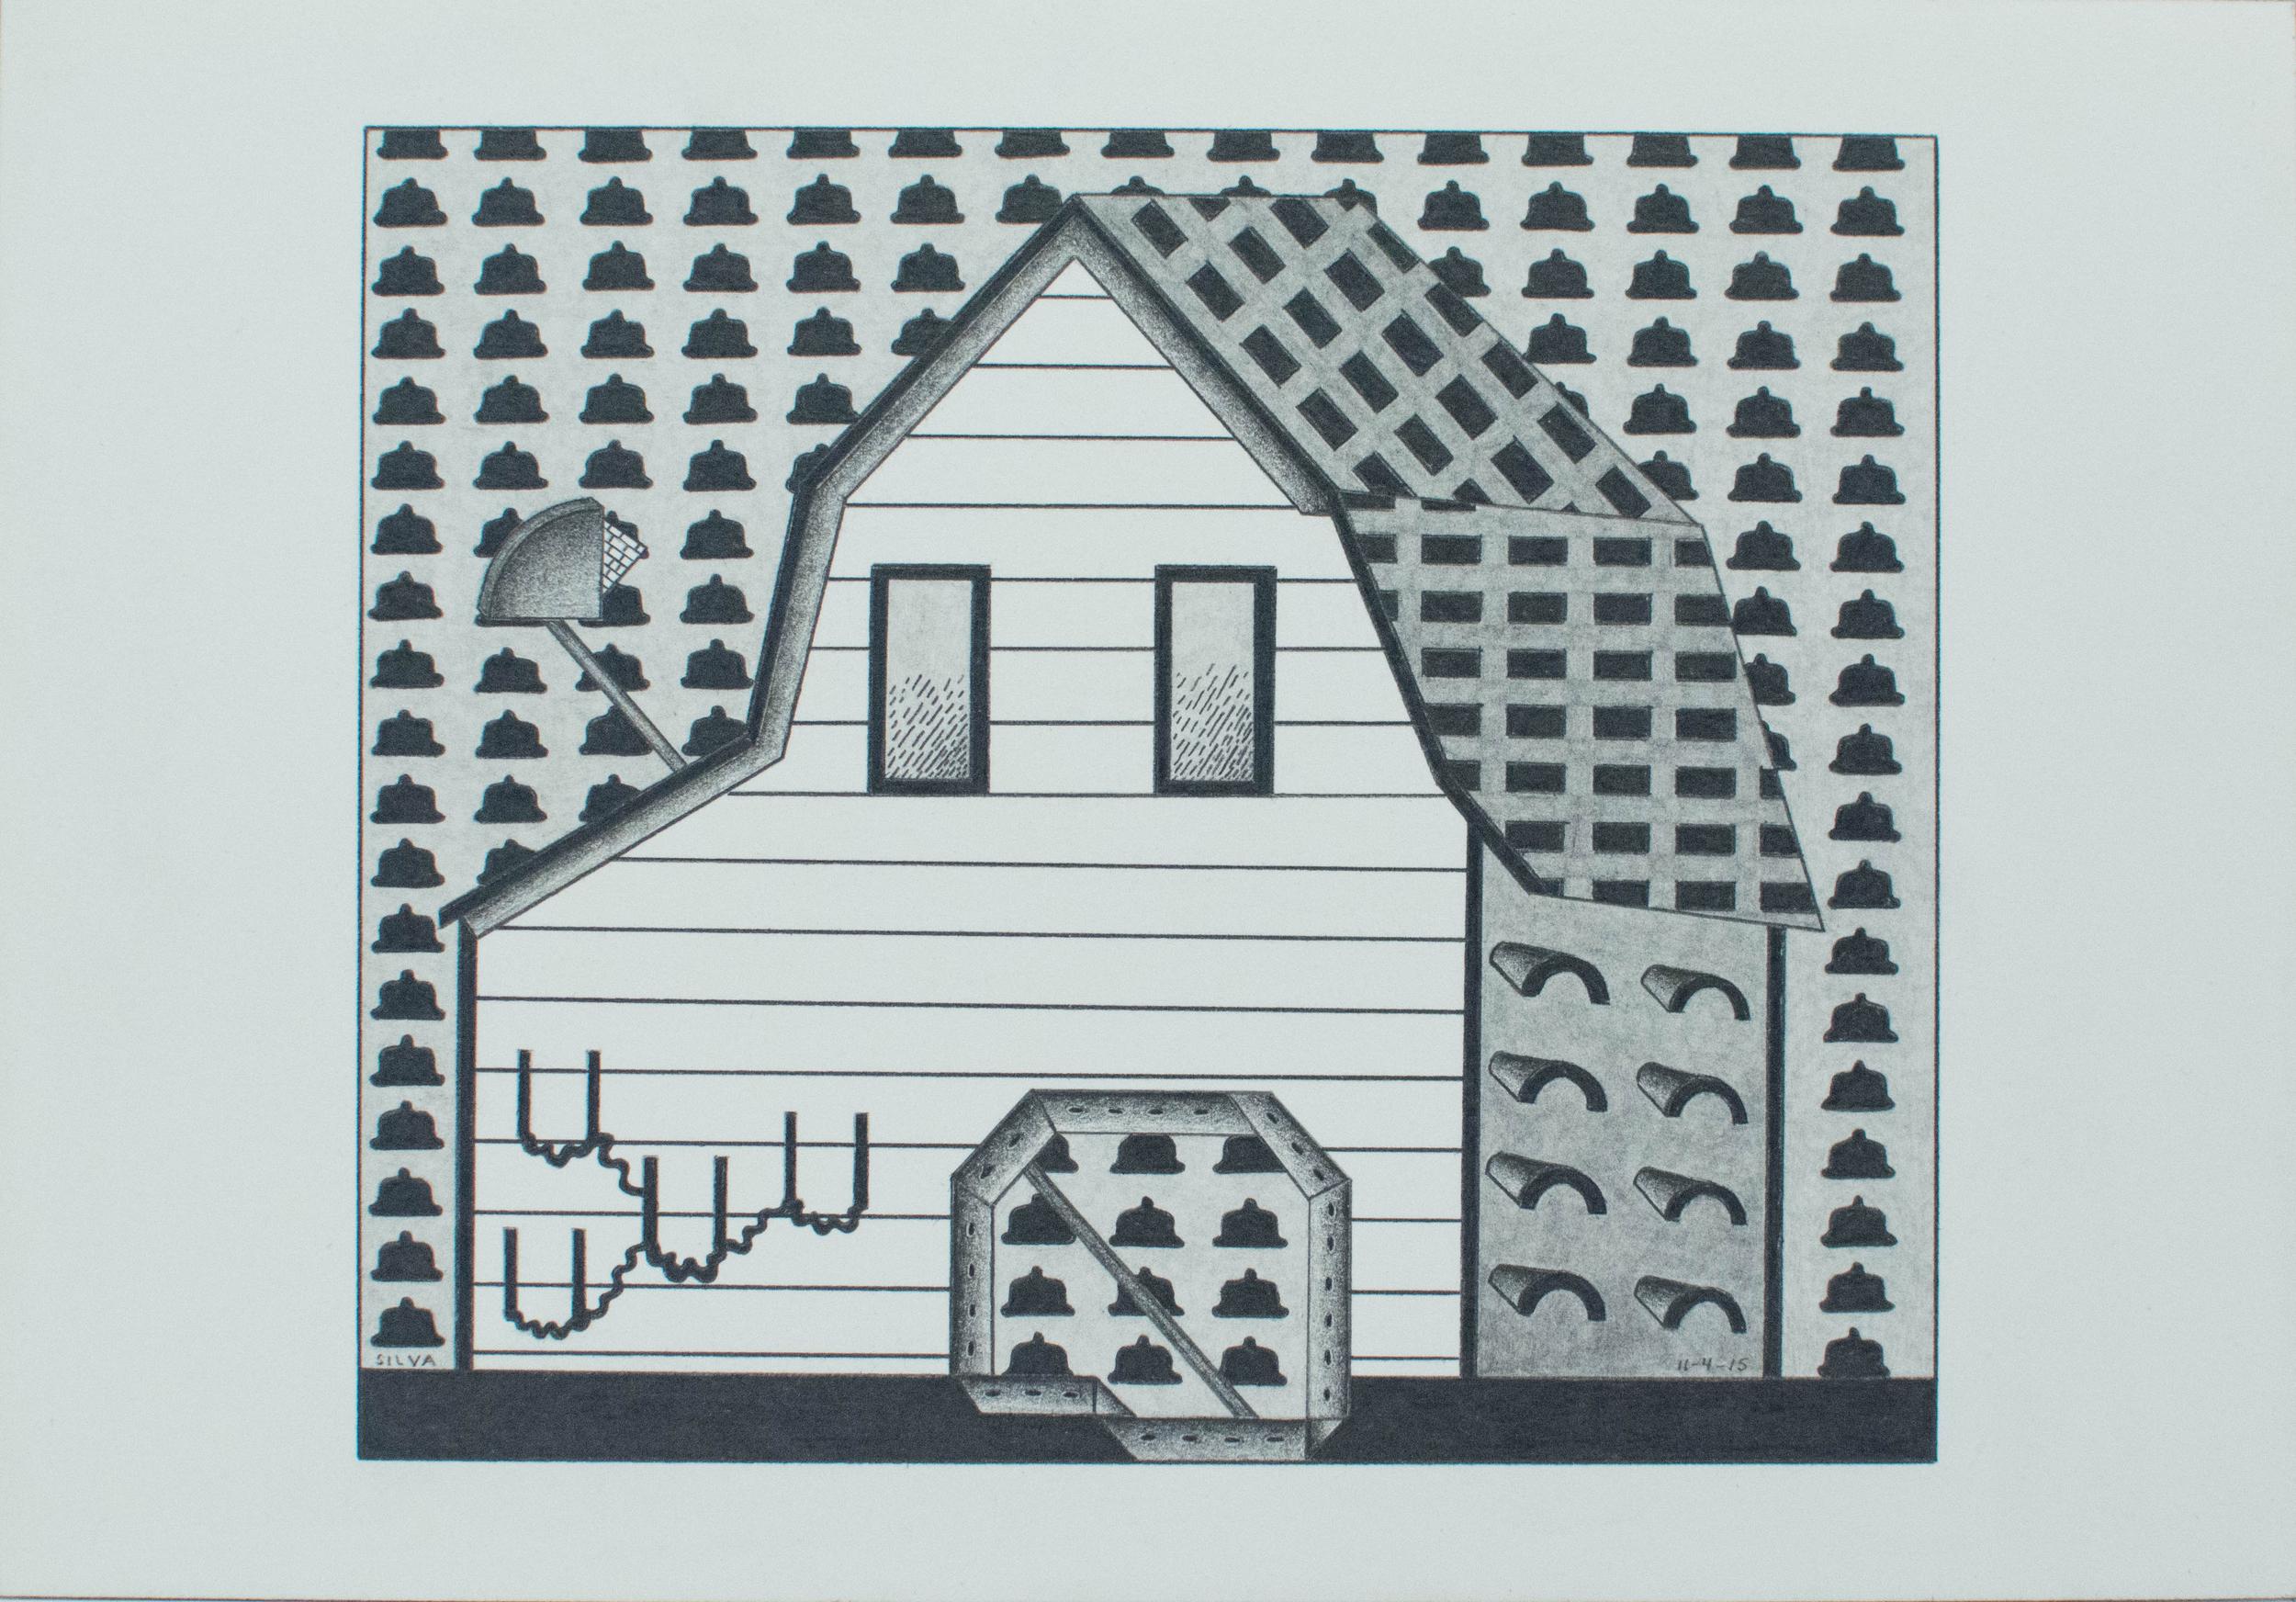 11-4-15, 2015, Graphite on paper, 7 x 10 inches